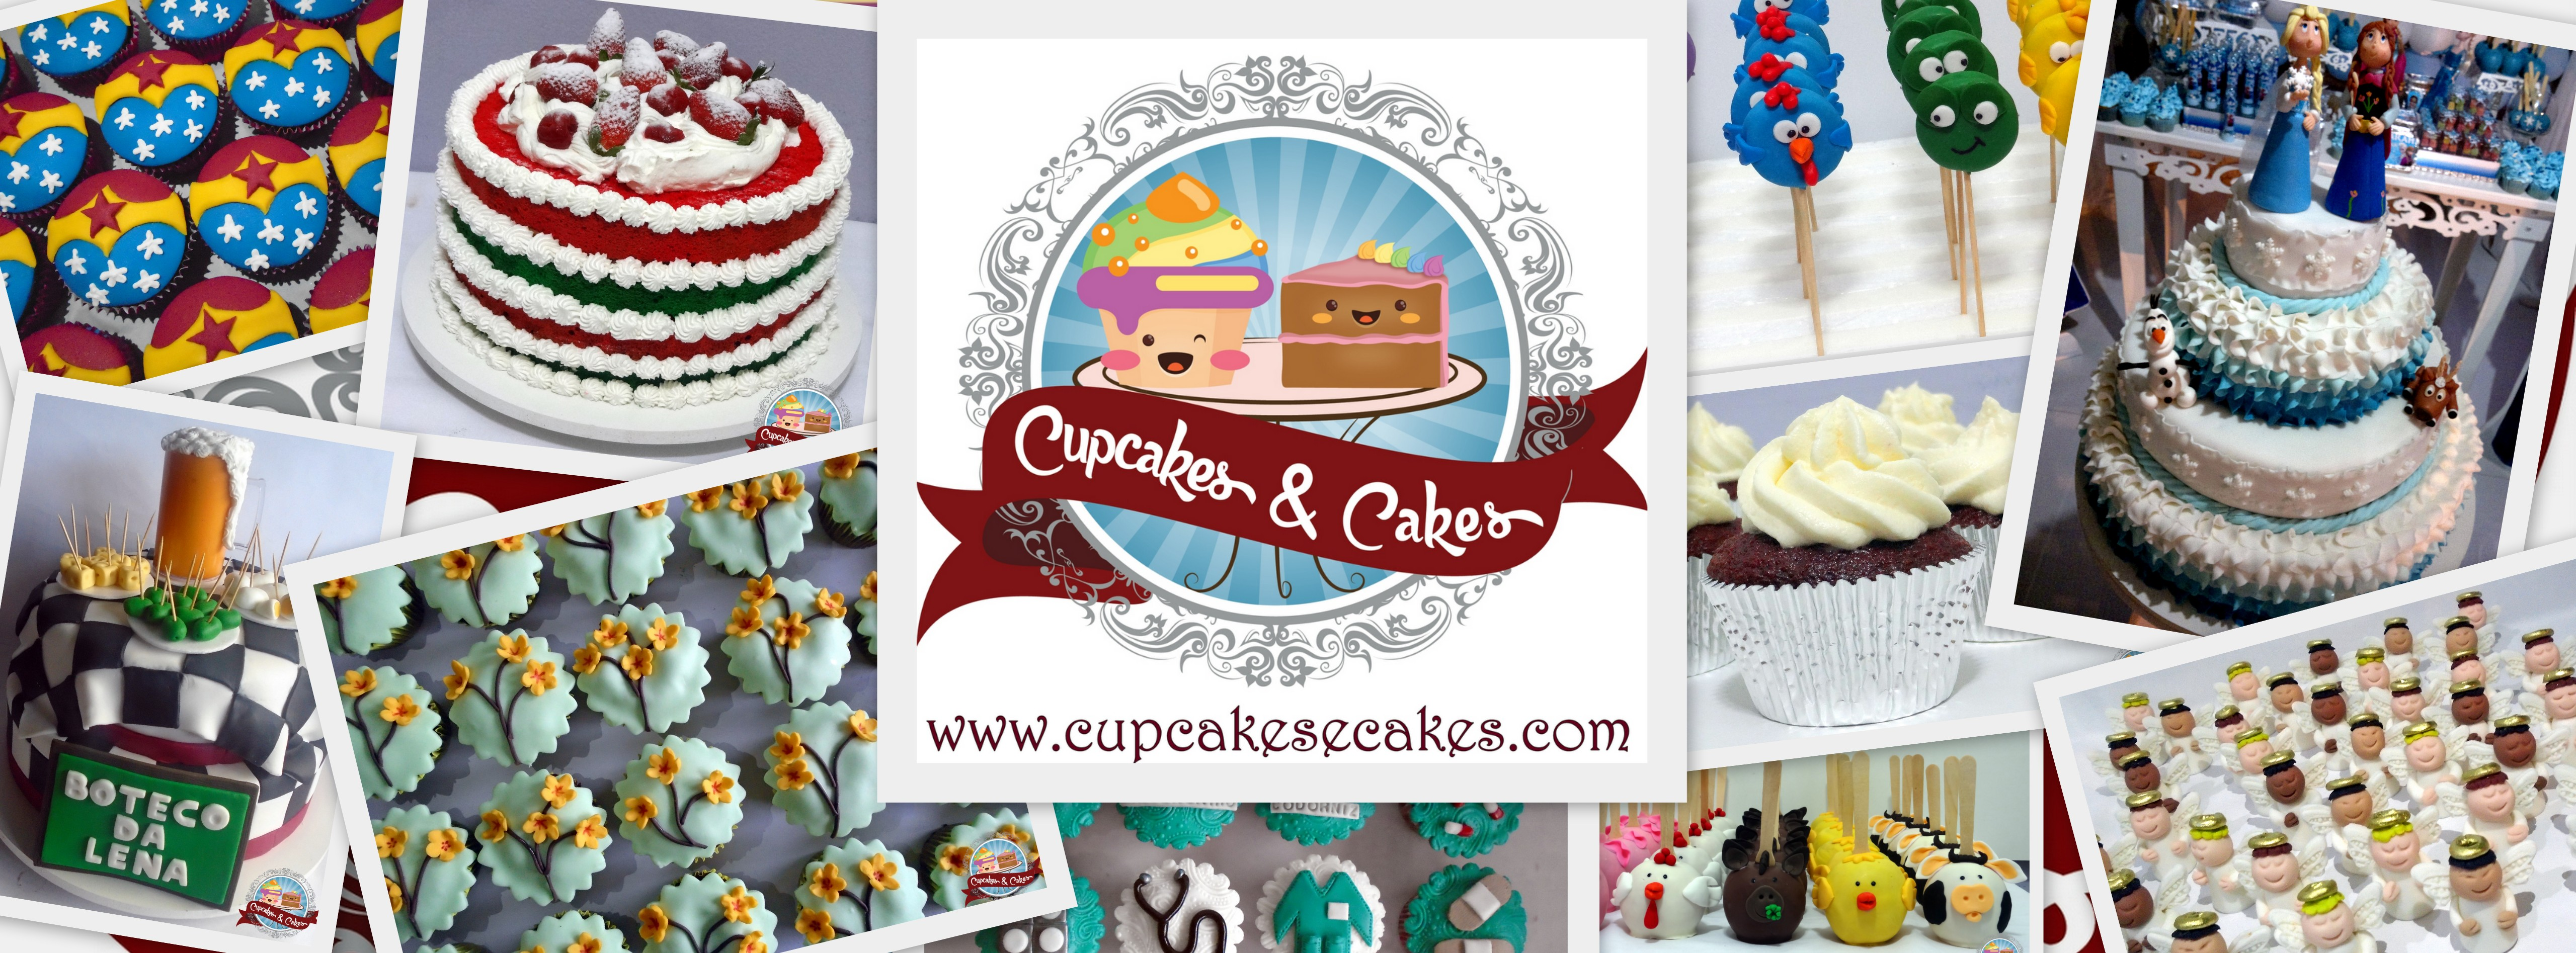 Só aqui na Cupcakes & Cakes®